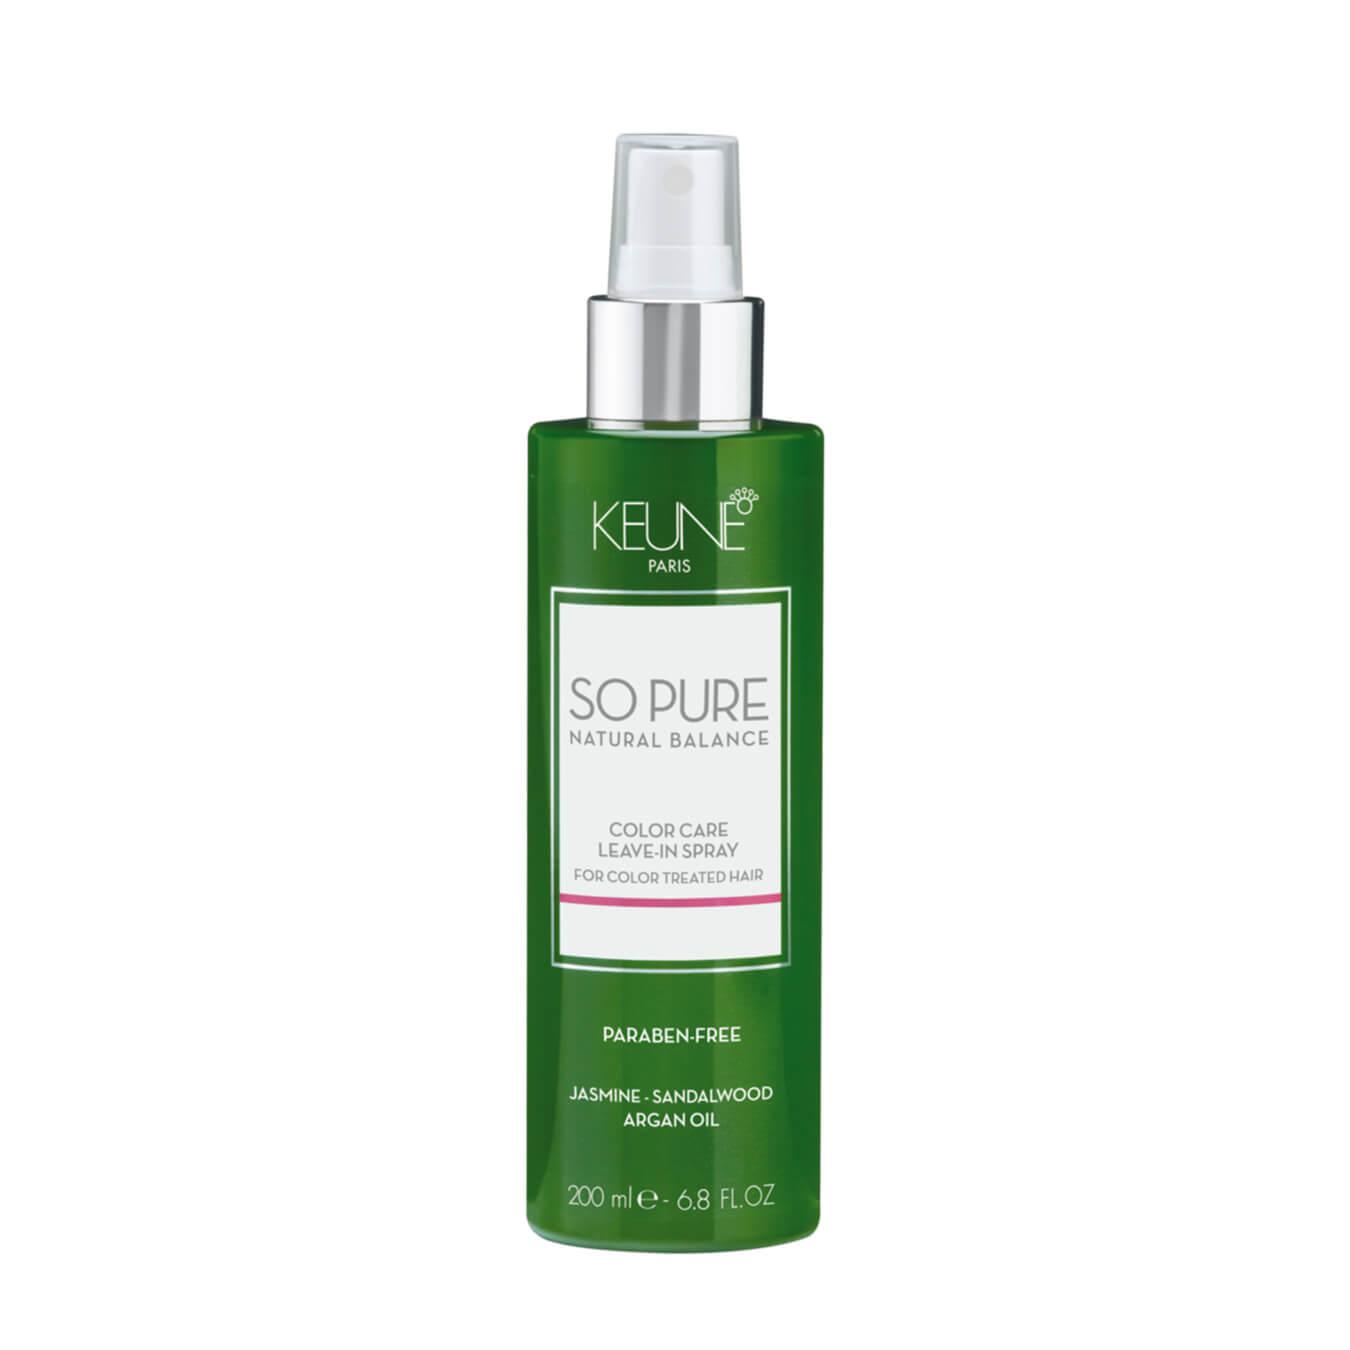 Kauf Keune So Pure Color Care Leave-in Spray 200ml